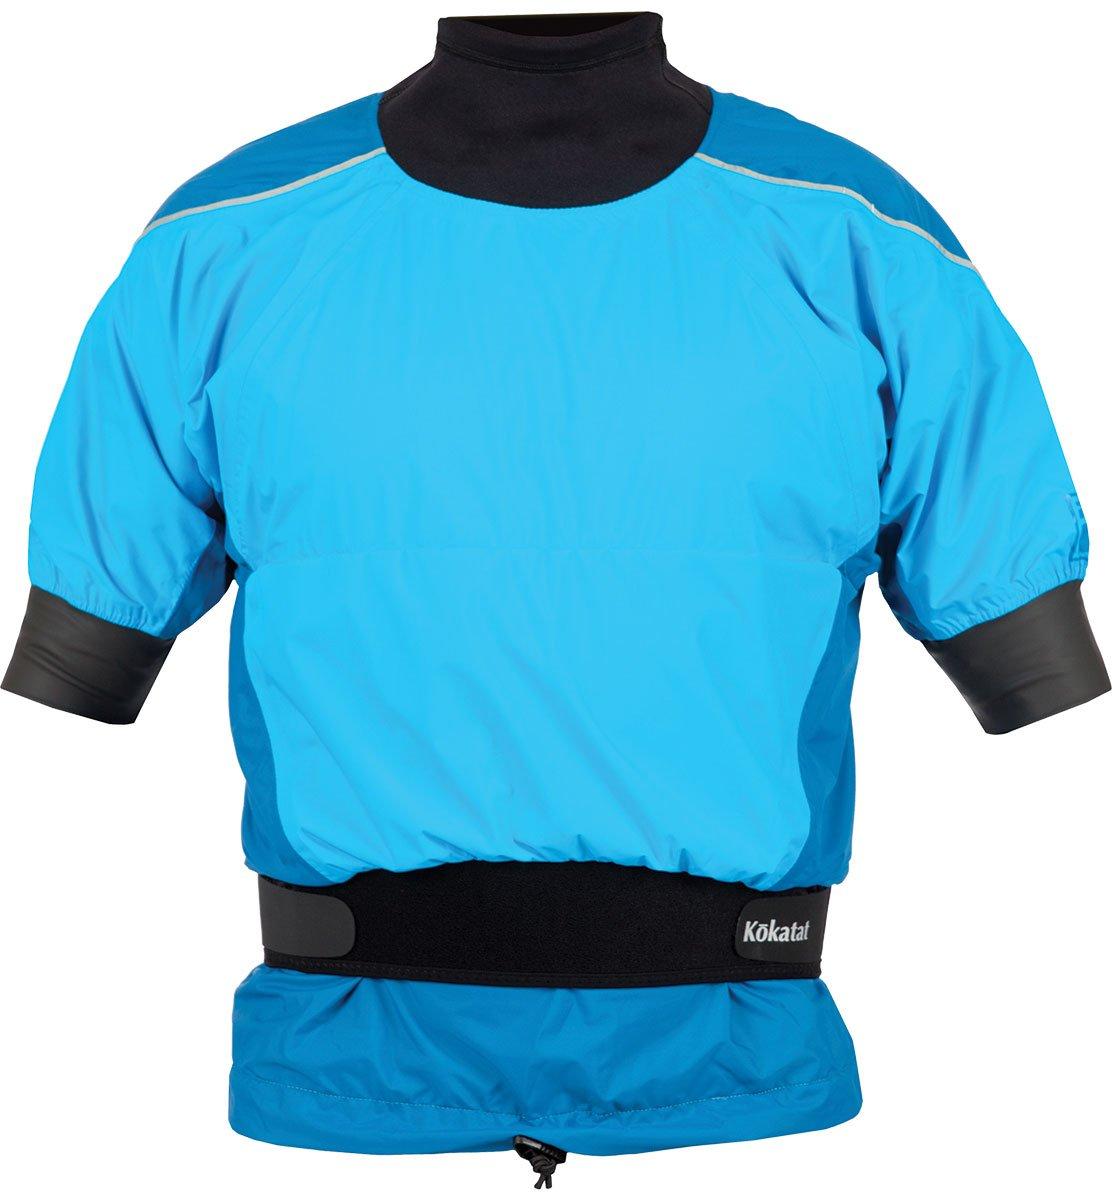 Kokatat Hydrus Blast Paddlingジャケット Large ブルー(Electric Blue) B079BCT6FL